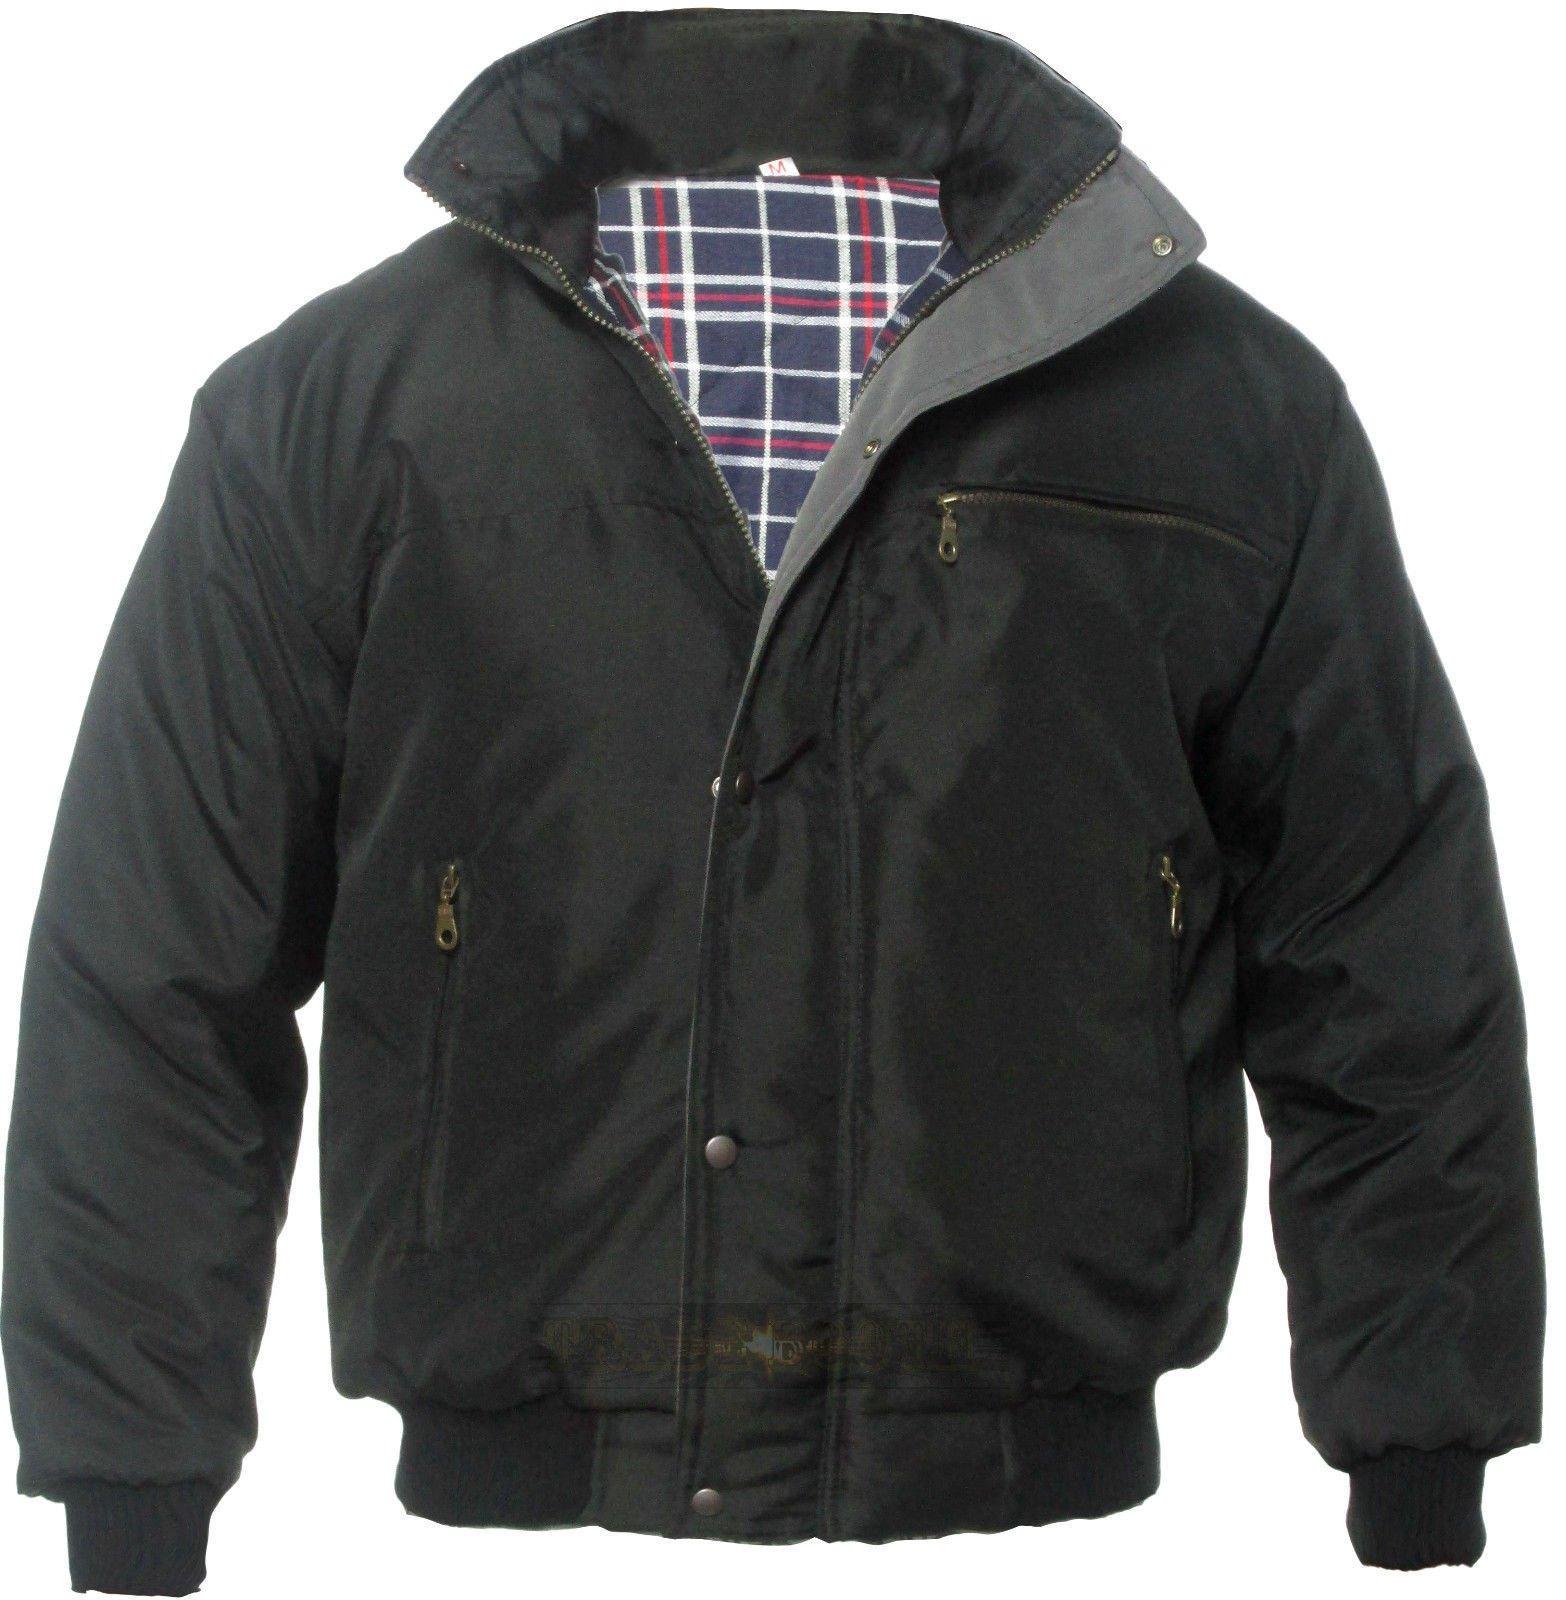 Men's Sky Diver Bomber Warm Padded Jacket Check Lined Work Winter Coat Black